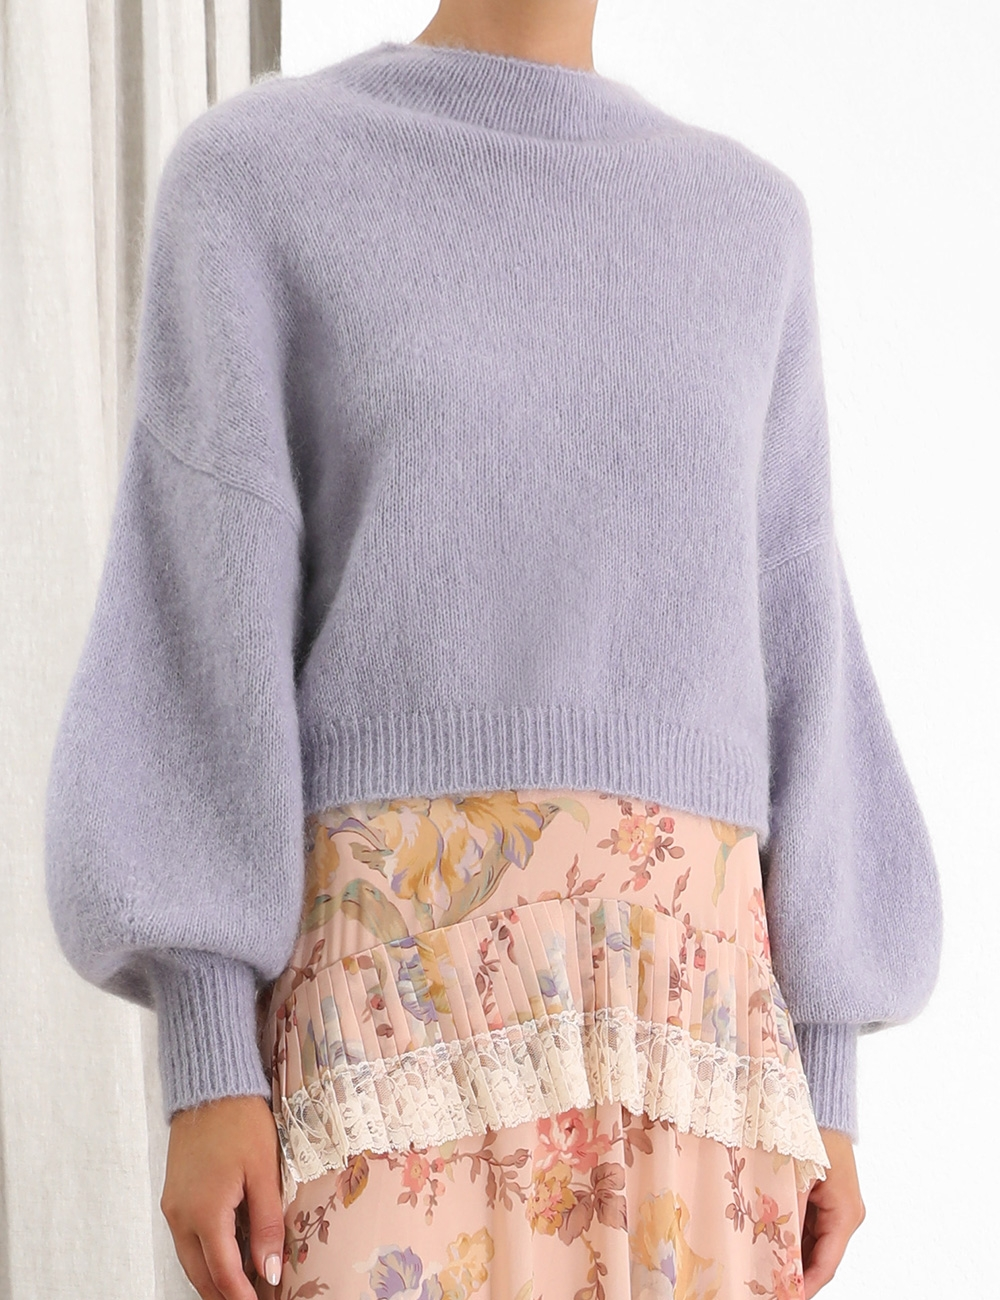 Espionage Lantern Sweater